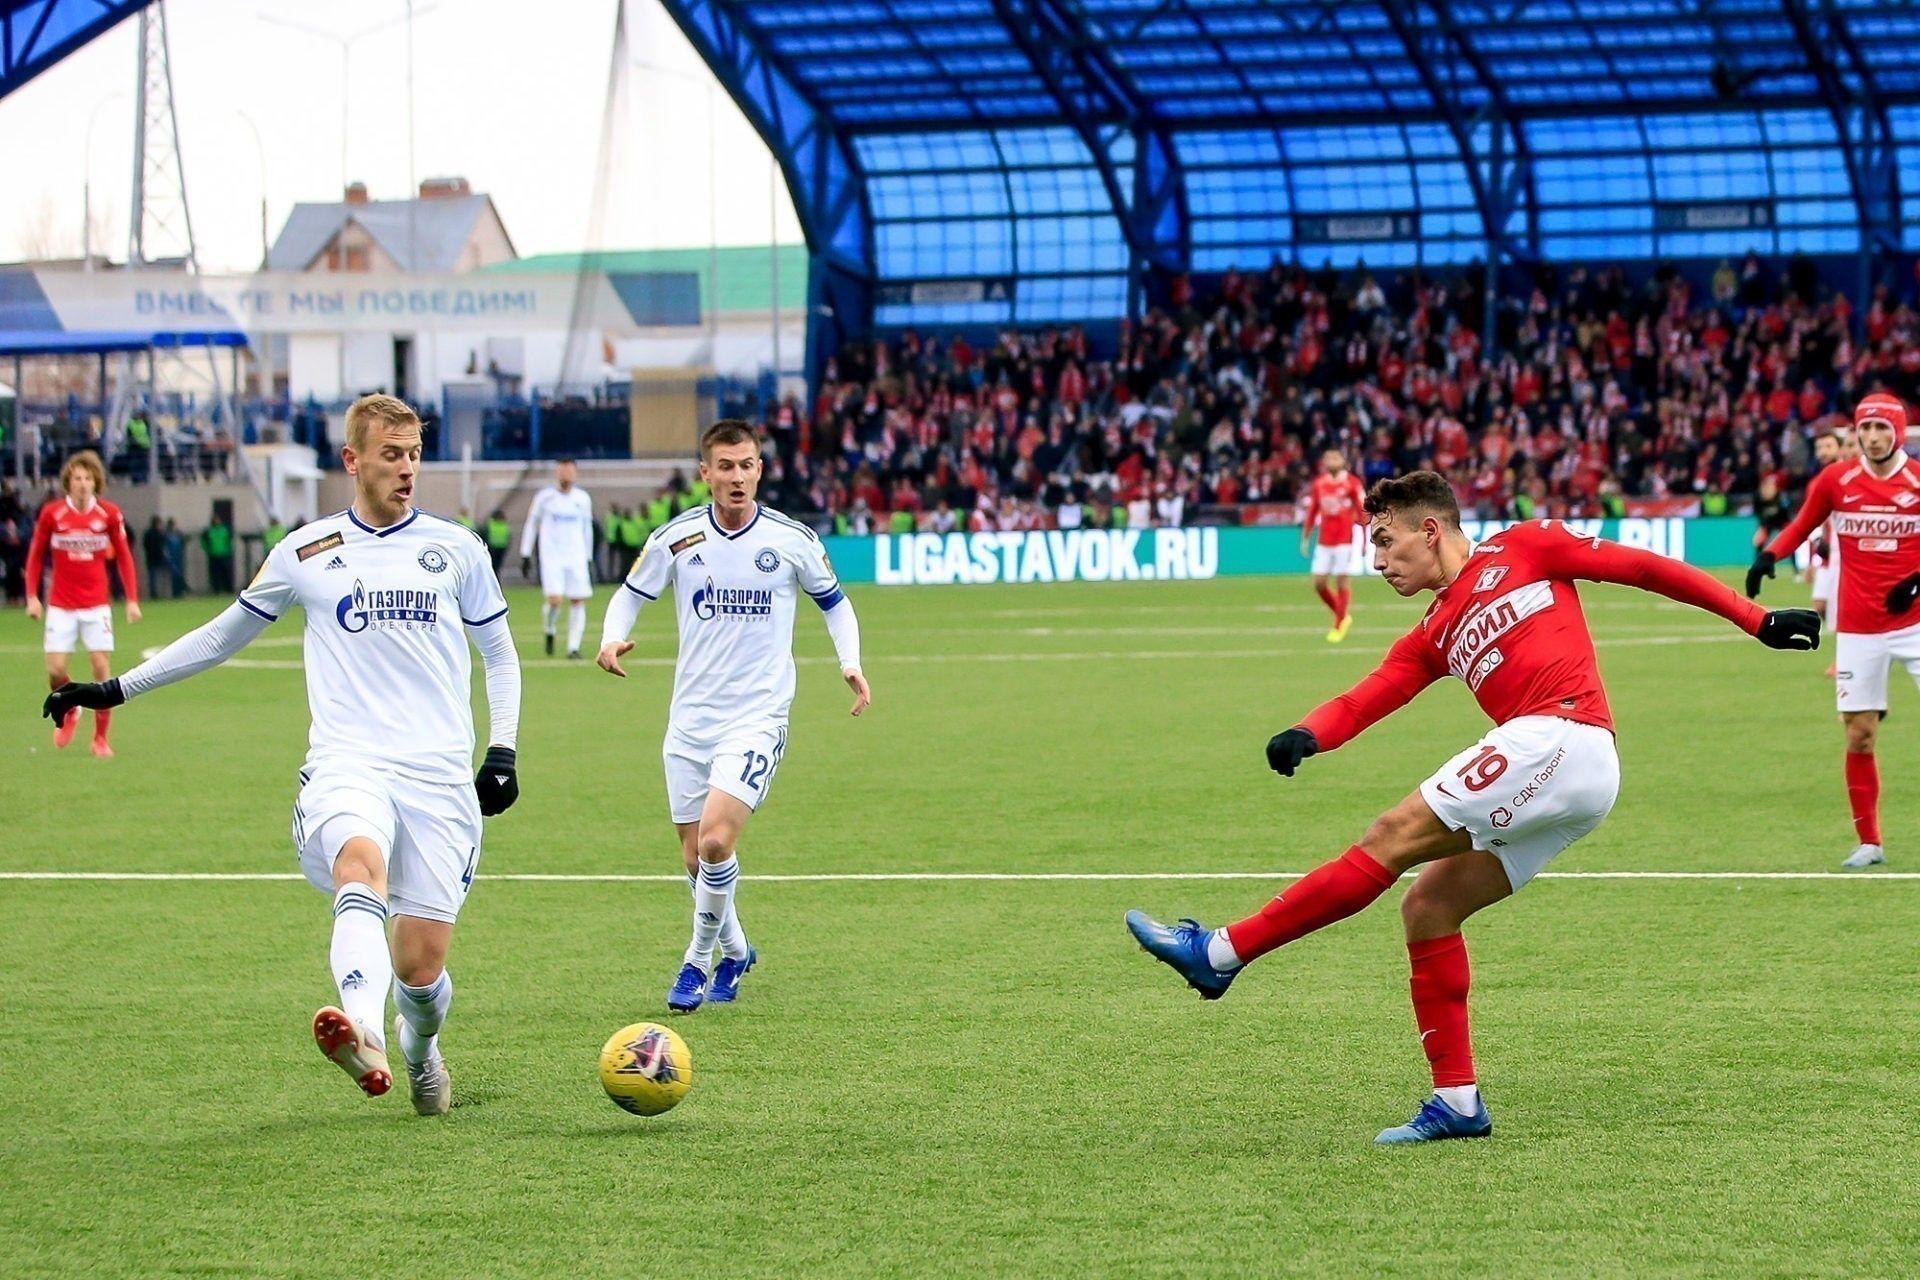 Ezequiel Ponce, AEK Atenas, Spartak Moscow, Liga de Rusia, Premier de Rusia